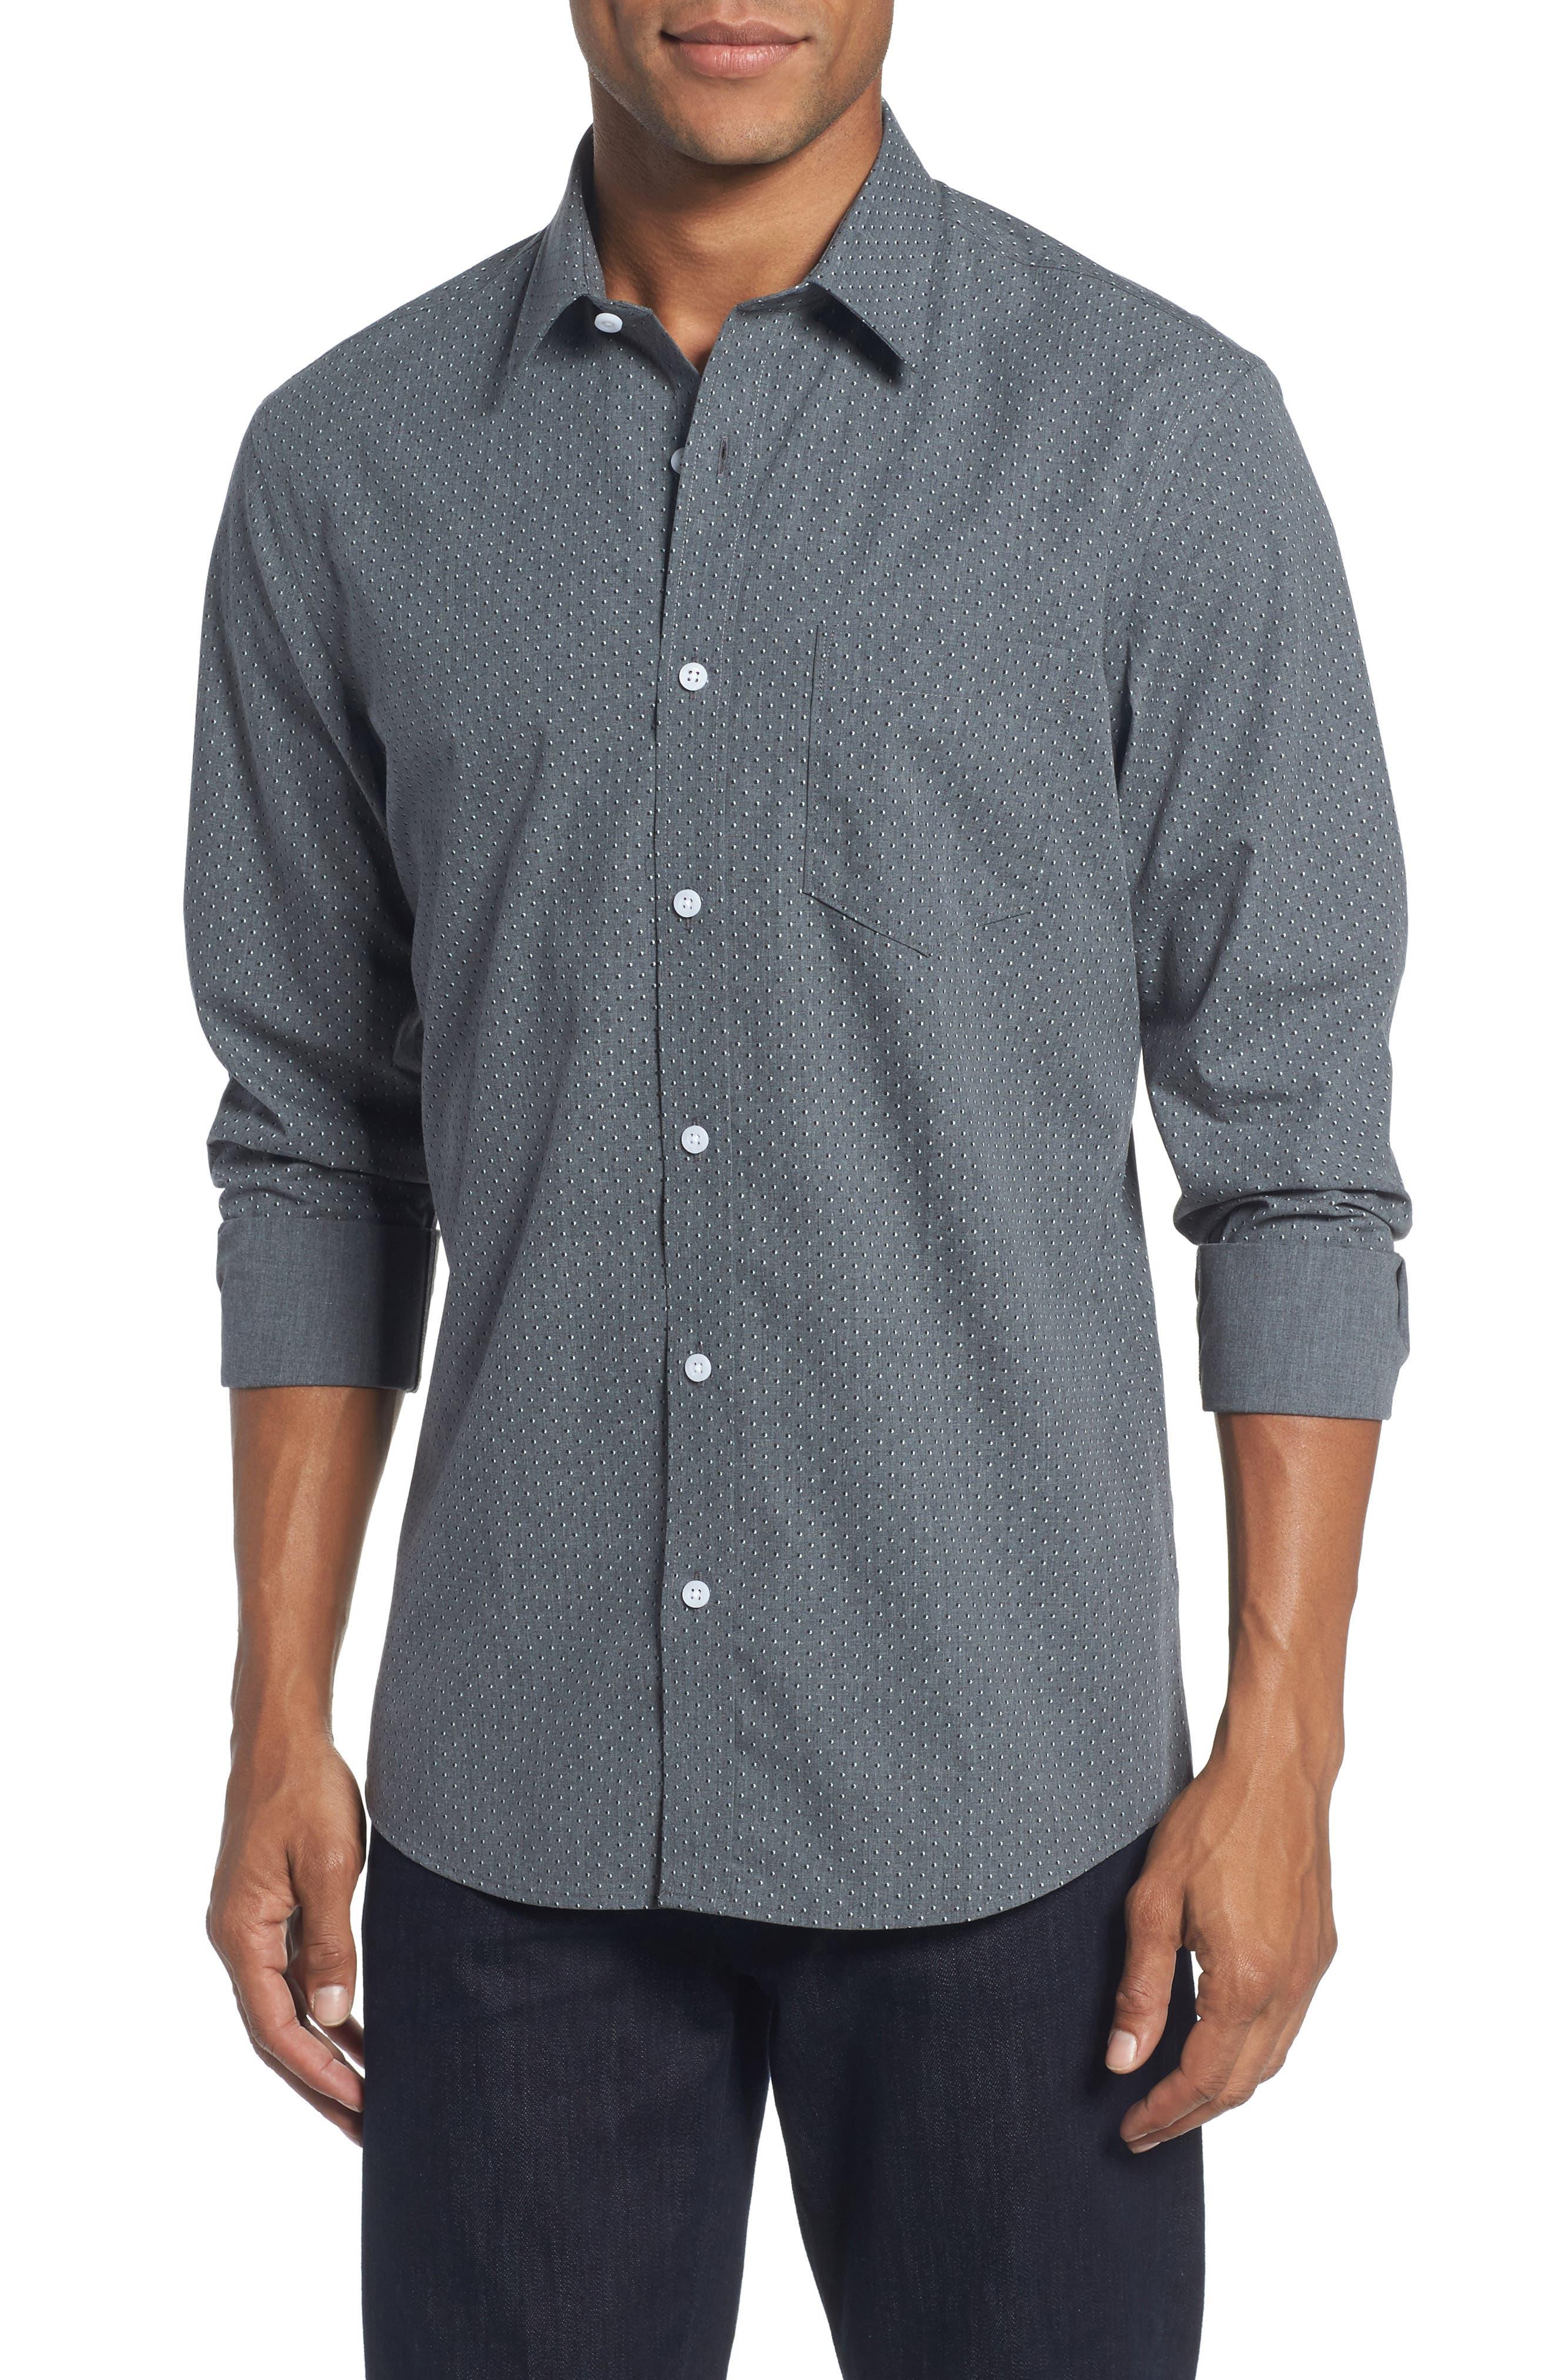 Main Image - Nordstrom Men's Shop Trim Fit Non-Iron Dot Print Sport Shirt